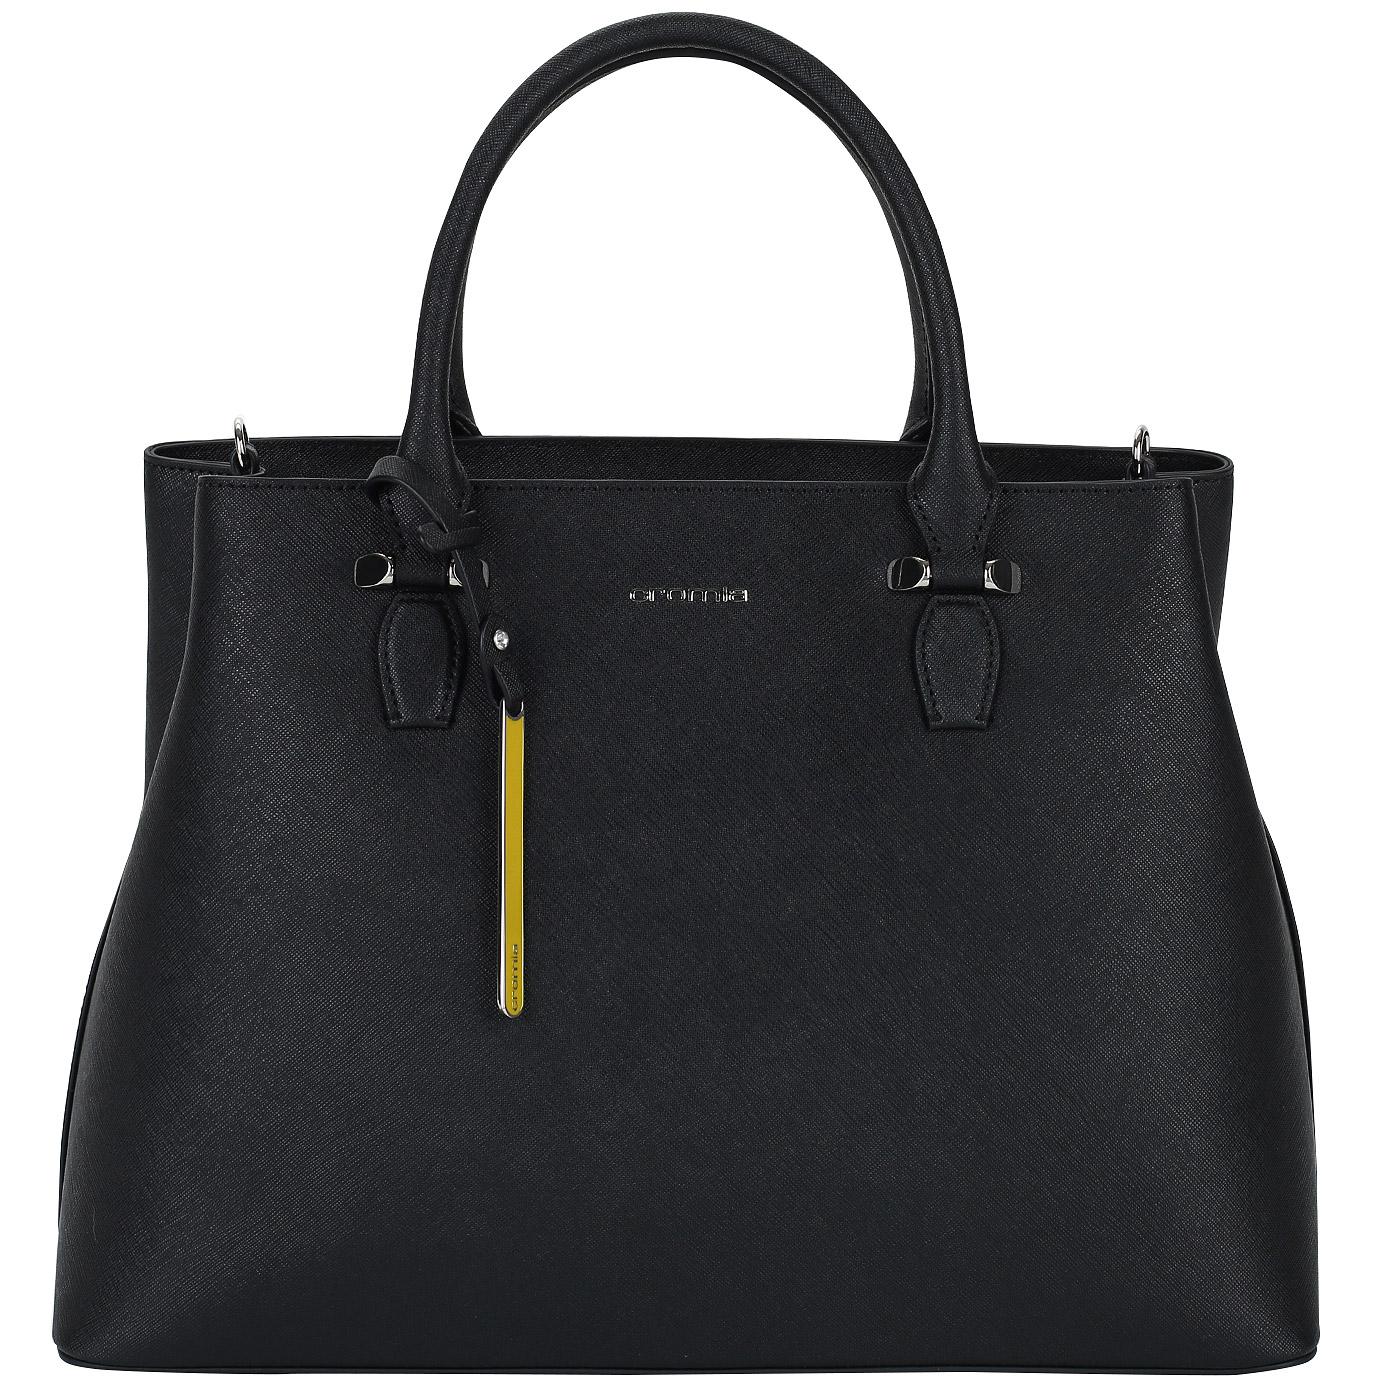 346ca2f487ca Женская сумка из сафьяна Cromia Perla 1403599_nero - 2000557793903 ...